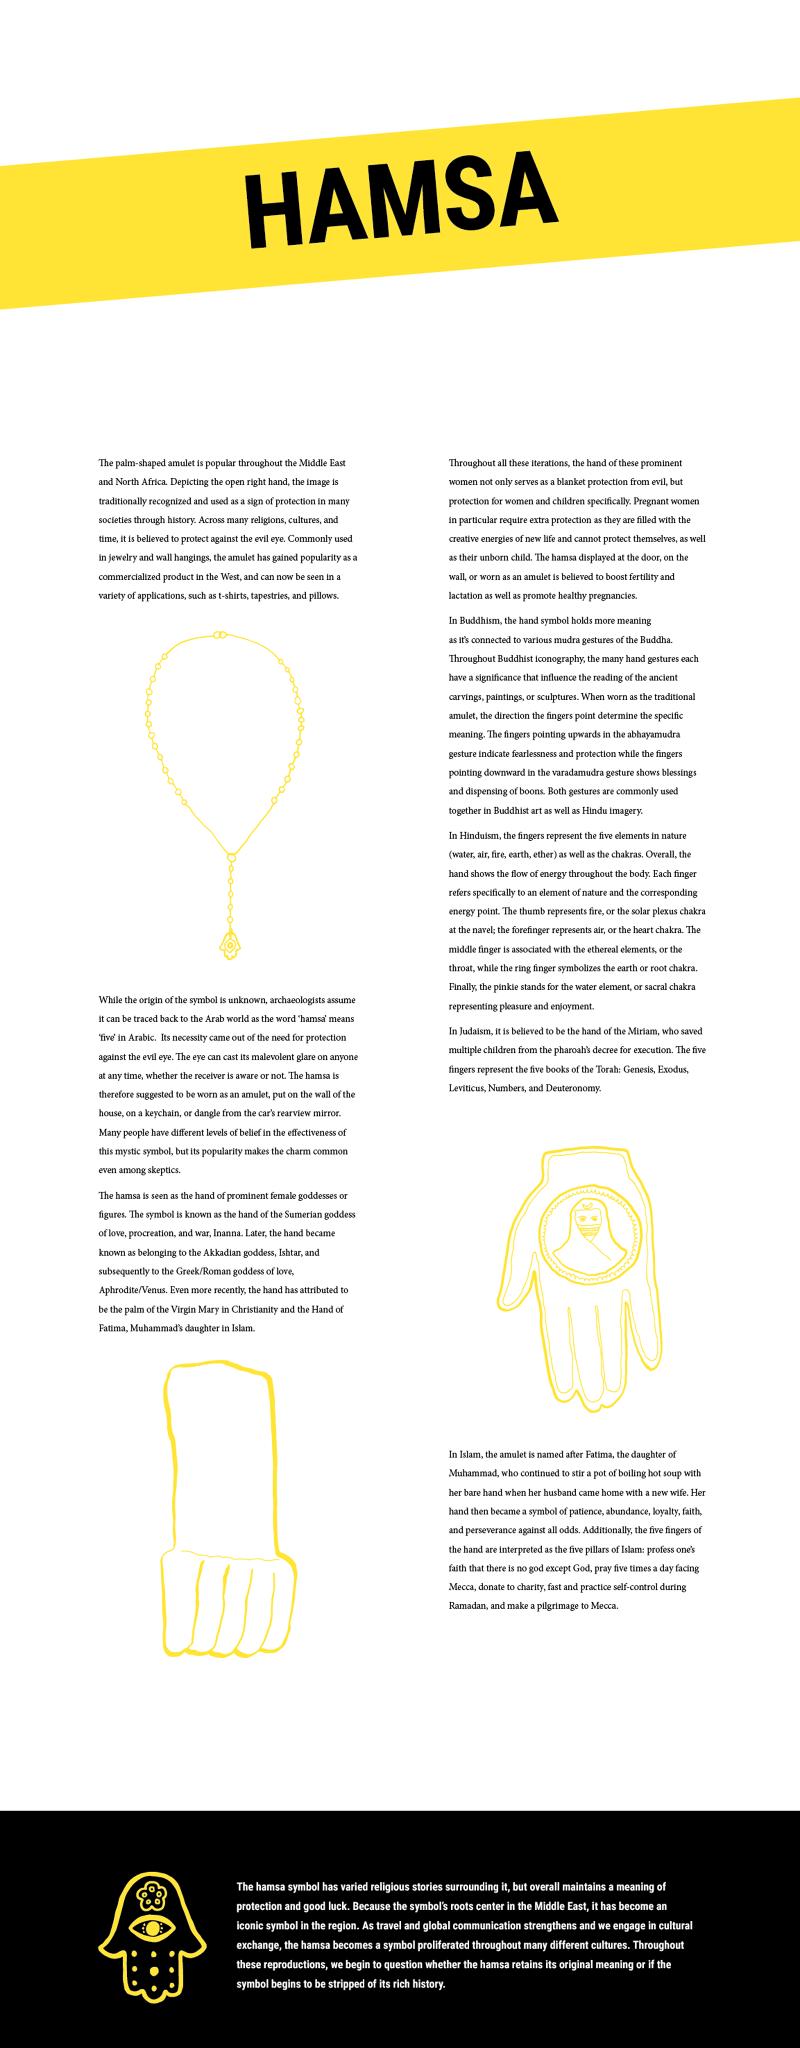 Buddha hand symbol meaning images symbol and sign ideas ok gerda design previous next 1 of 7 thumbnails buycottarizona buycottarizona